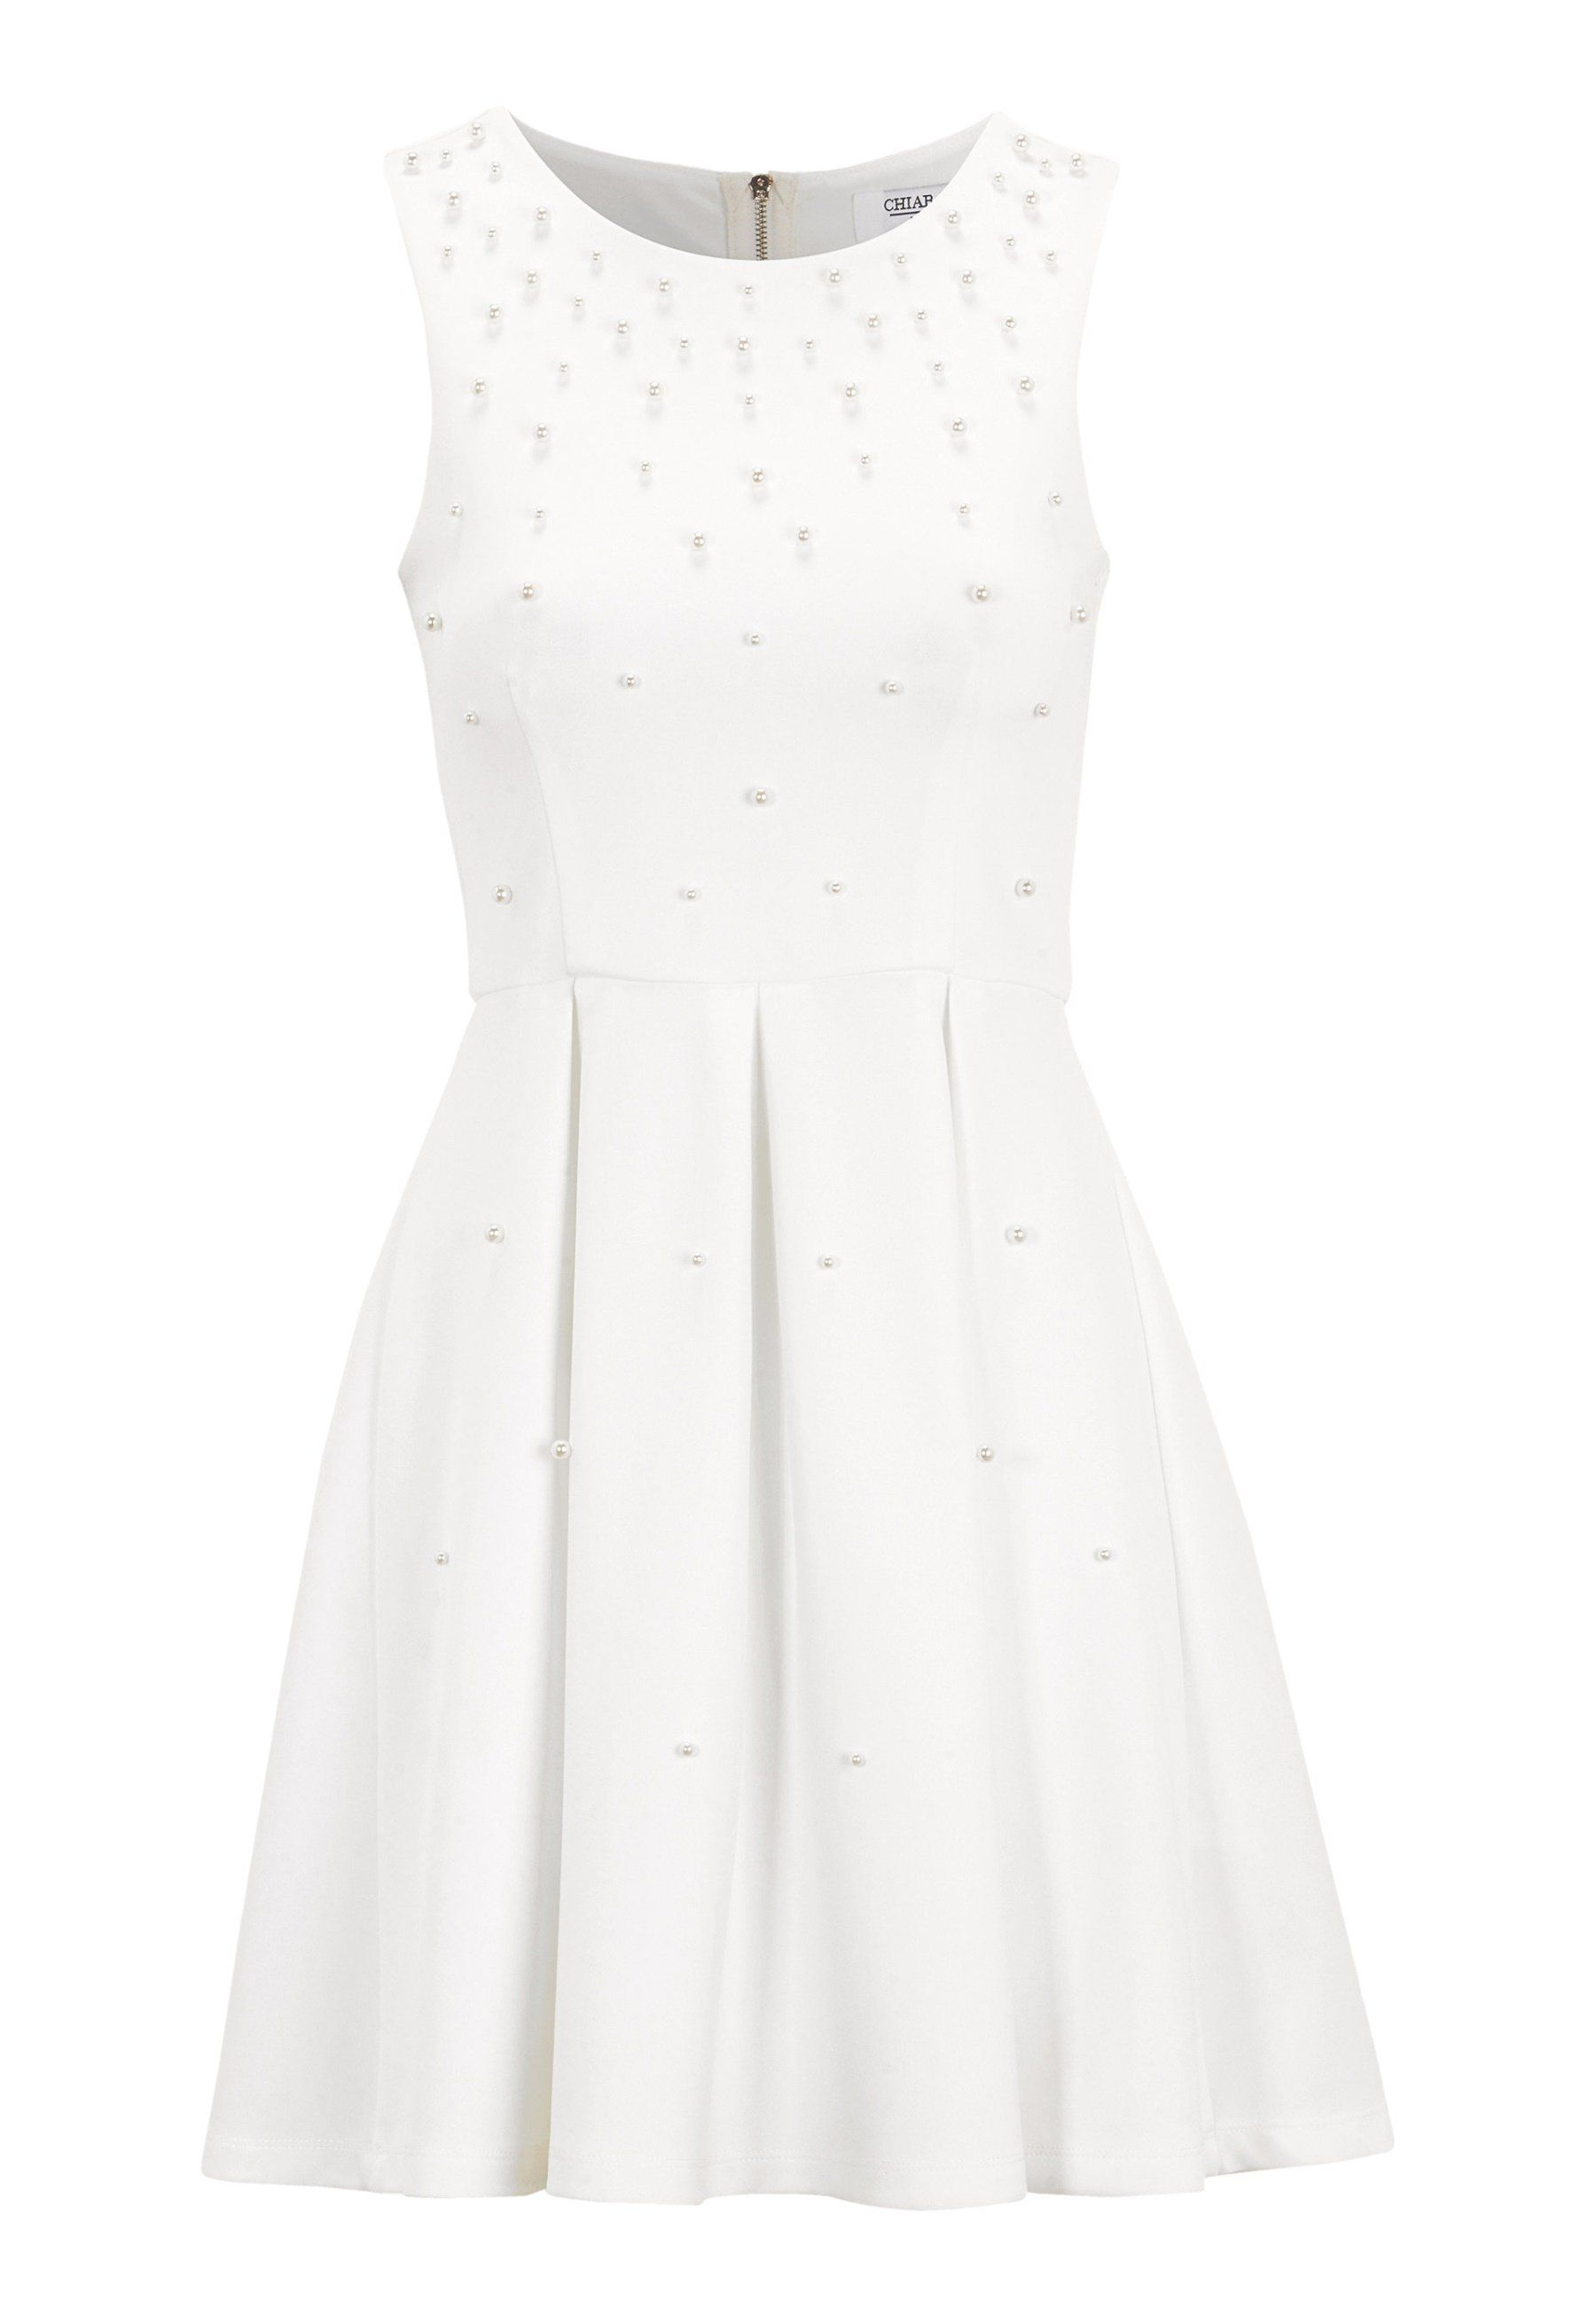 71a922cd Chiara Forthi Marla pearl dress White - Bubbleroom   studentkläder ...